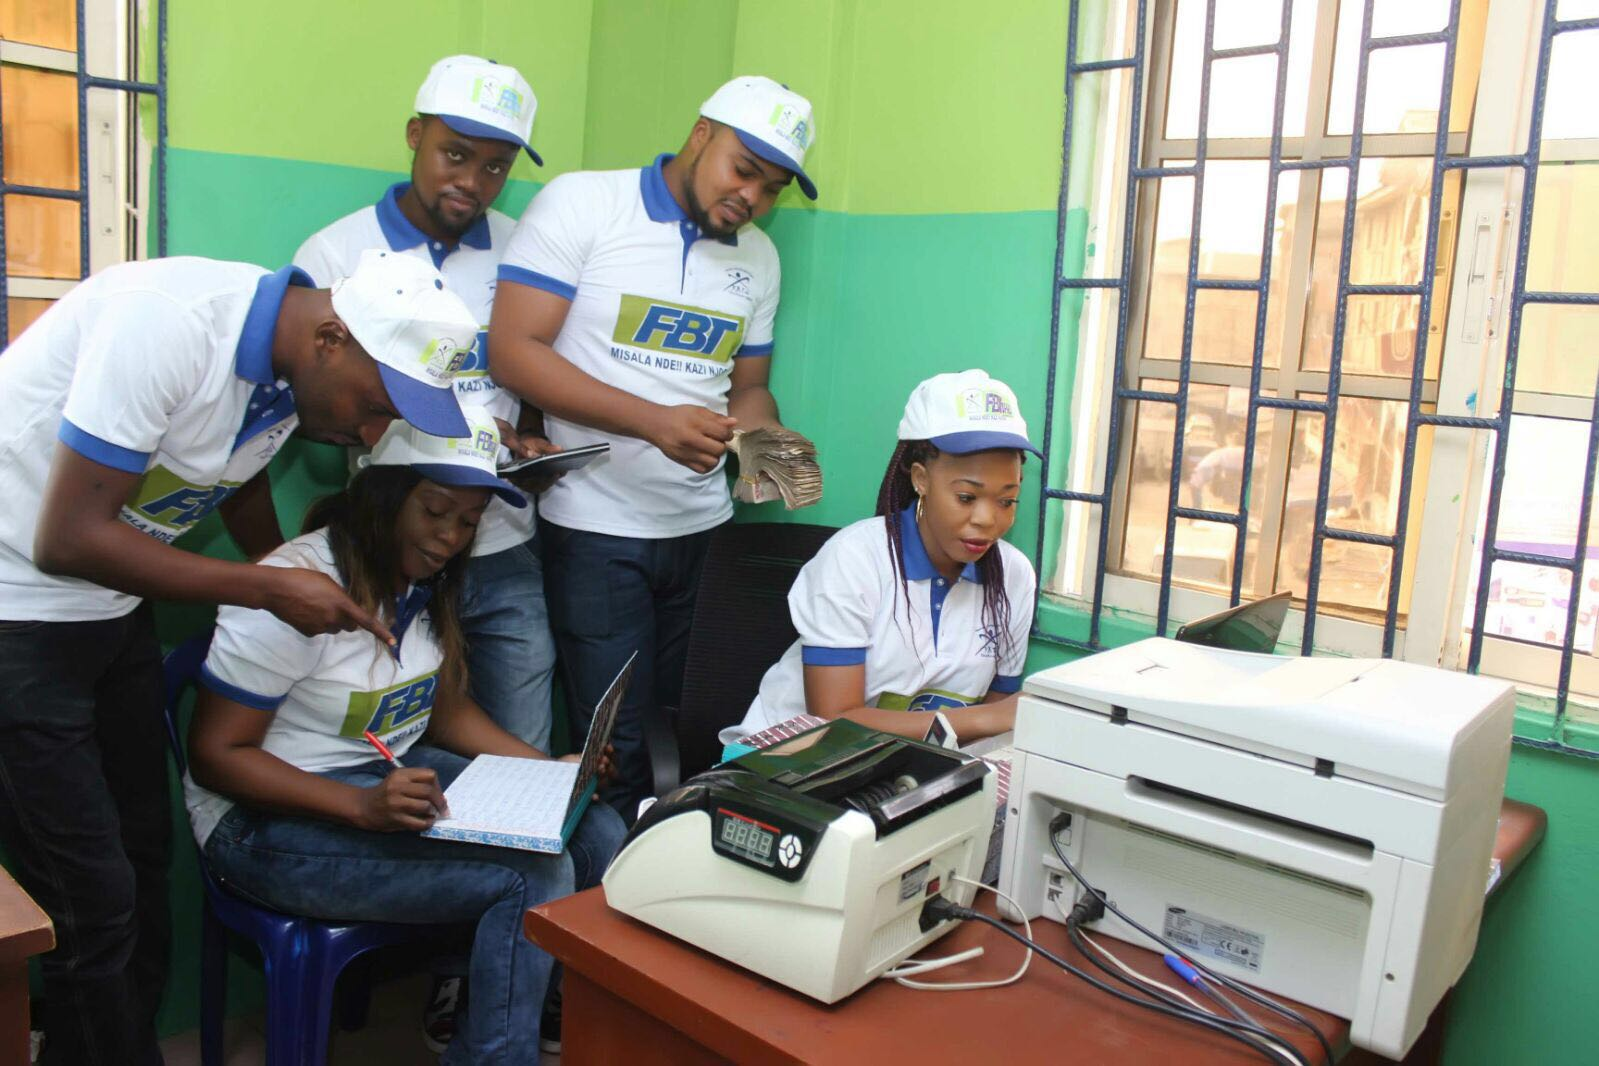 FBT Nigeria 4